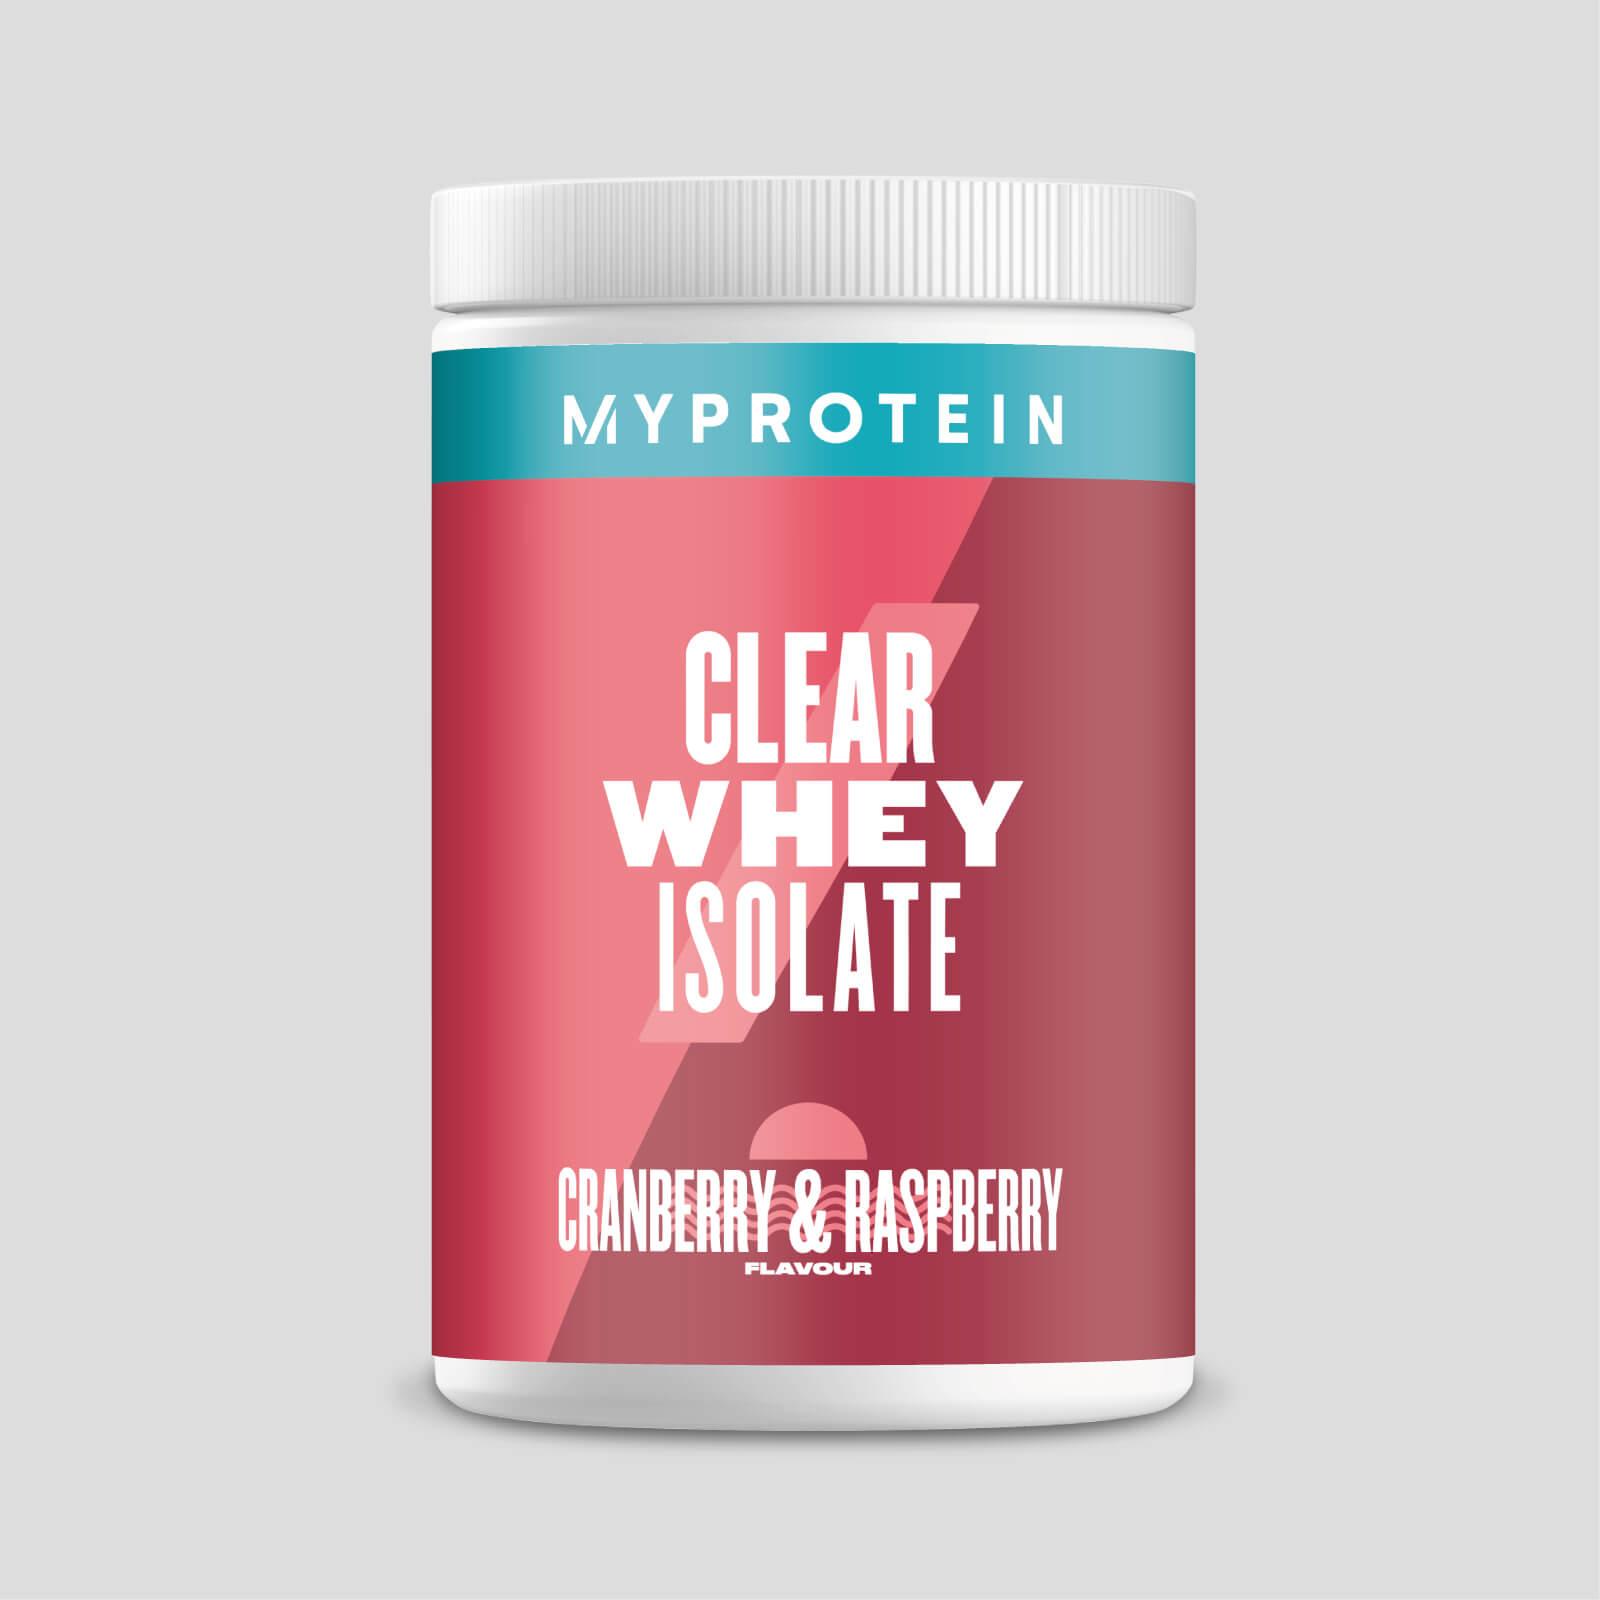 Lot de 2 sachets de protéines MyProtein Clear Whey Isolate Cranberry & Raspberry - 2x20 doses